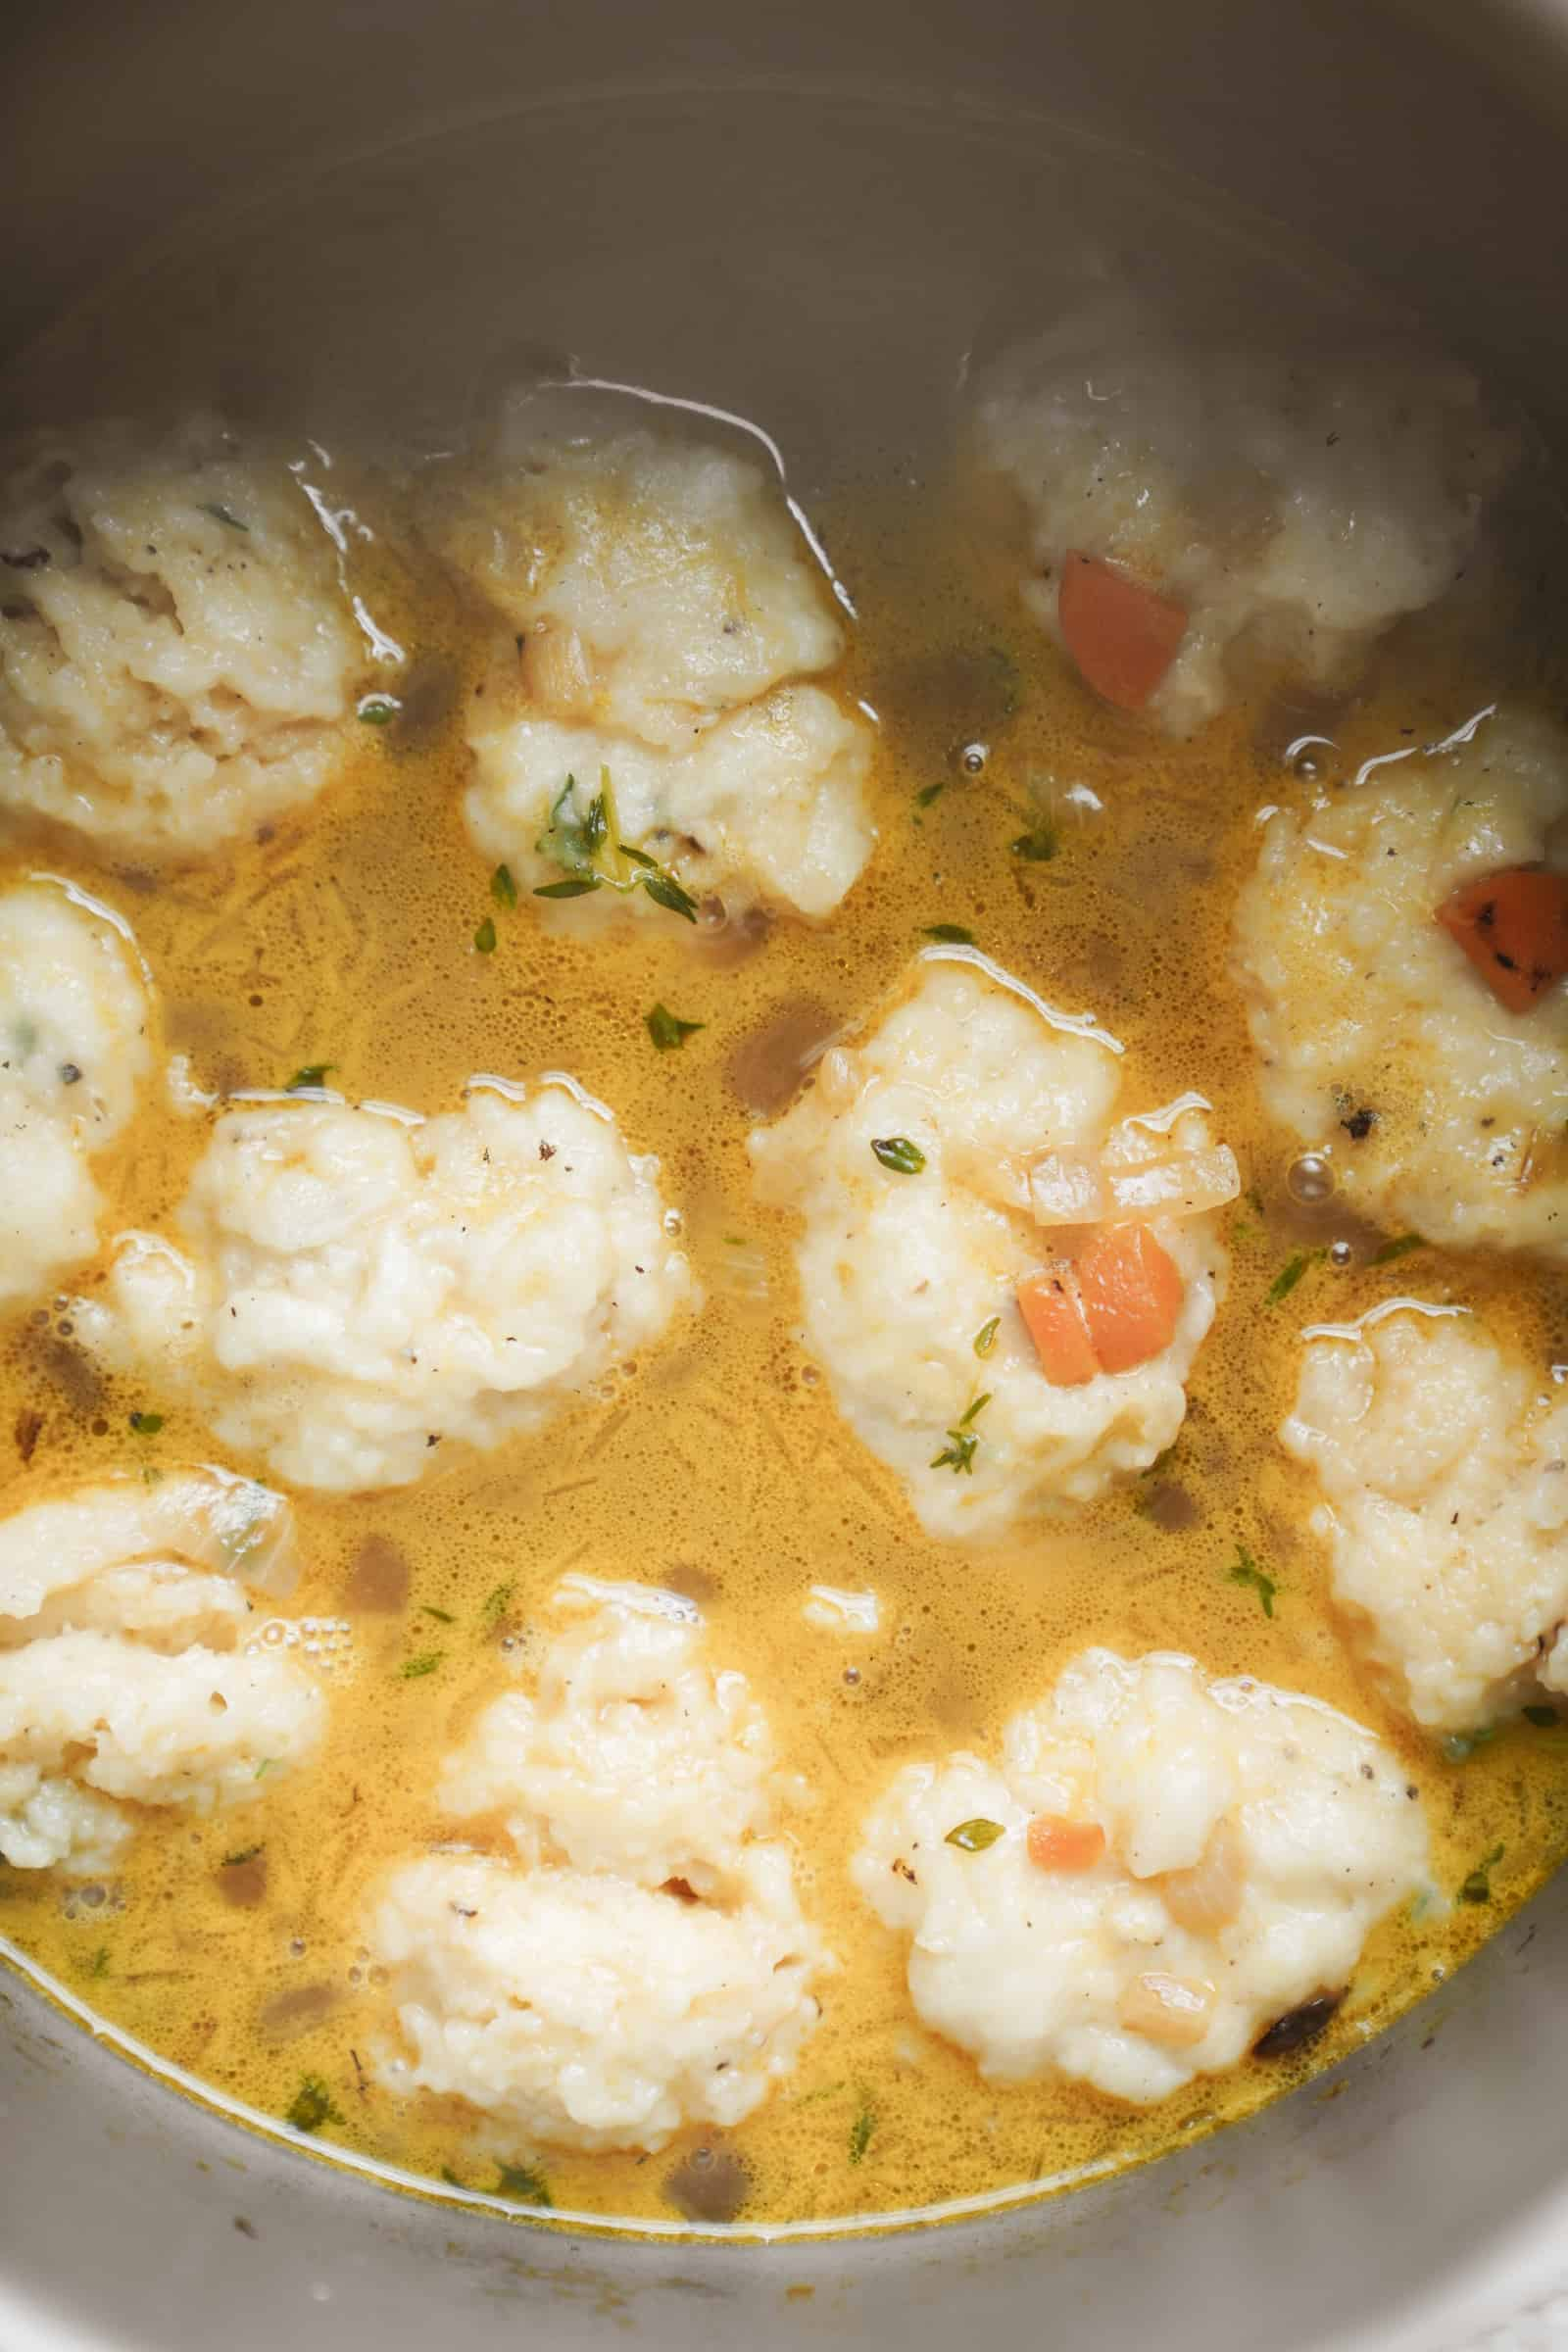 vegan dumplings & vegetable soup